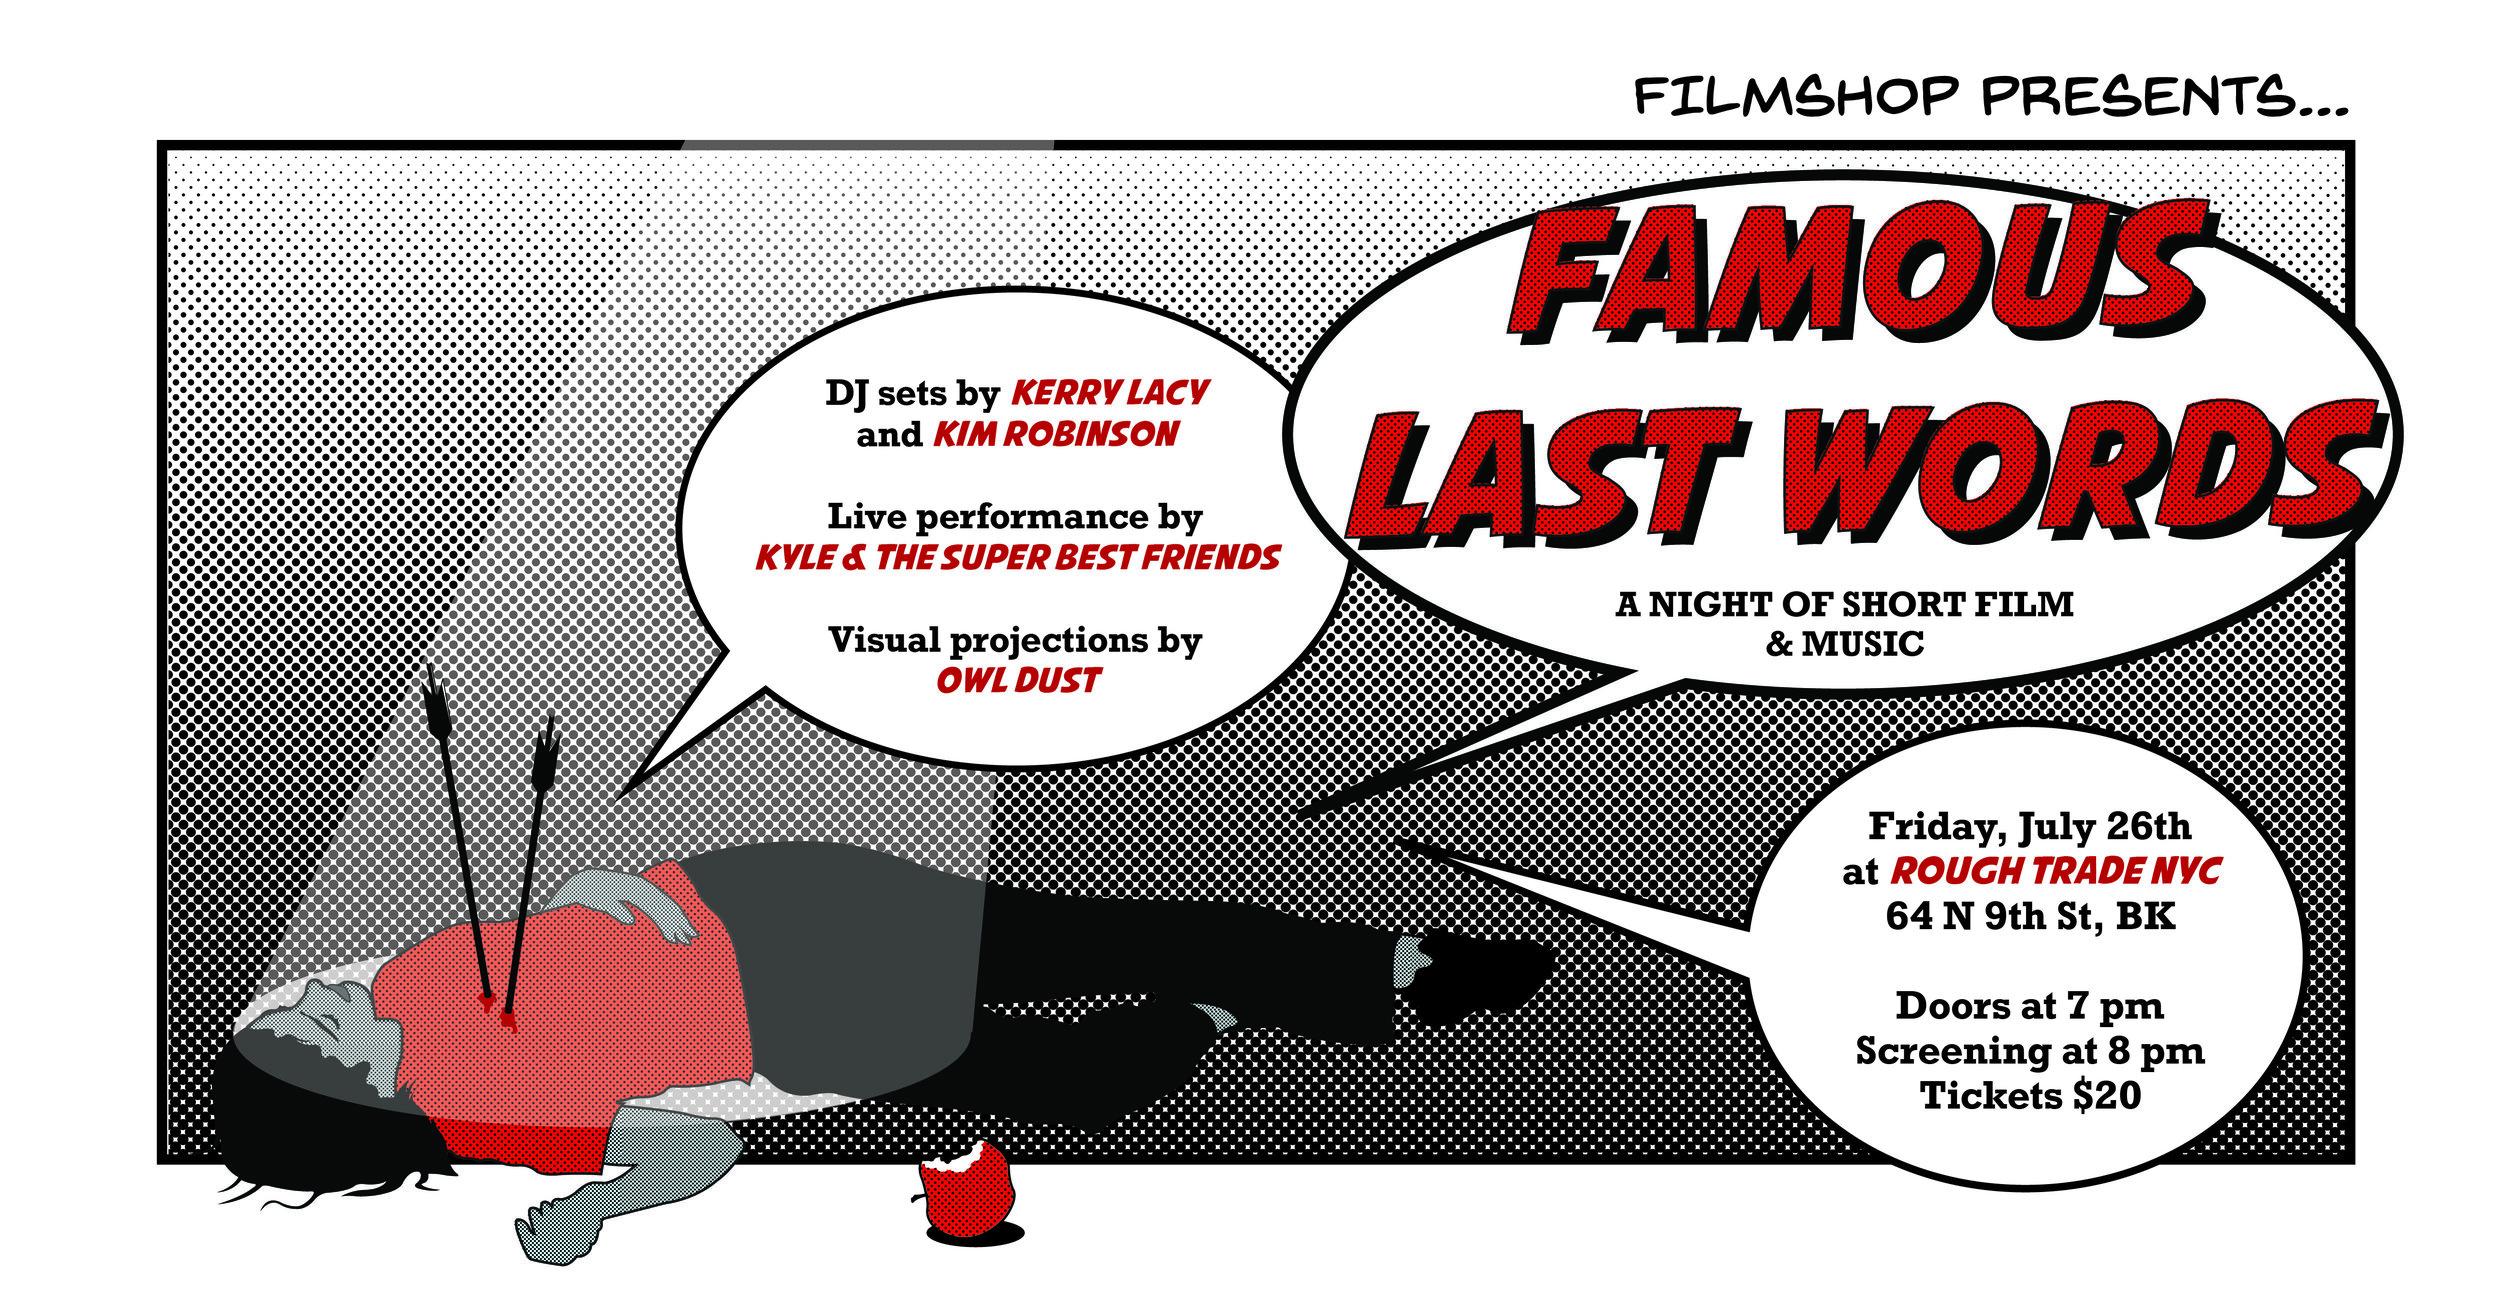 famouslastwords_banner_2.jpg